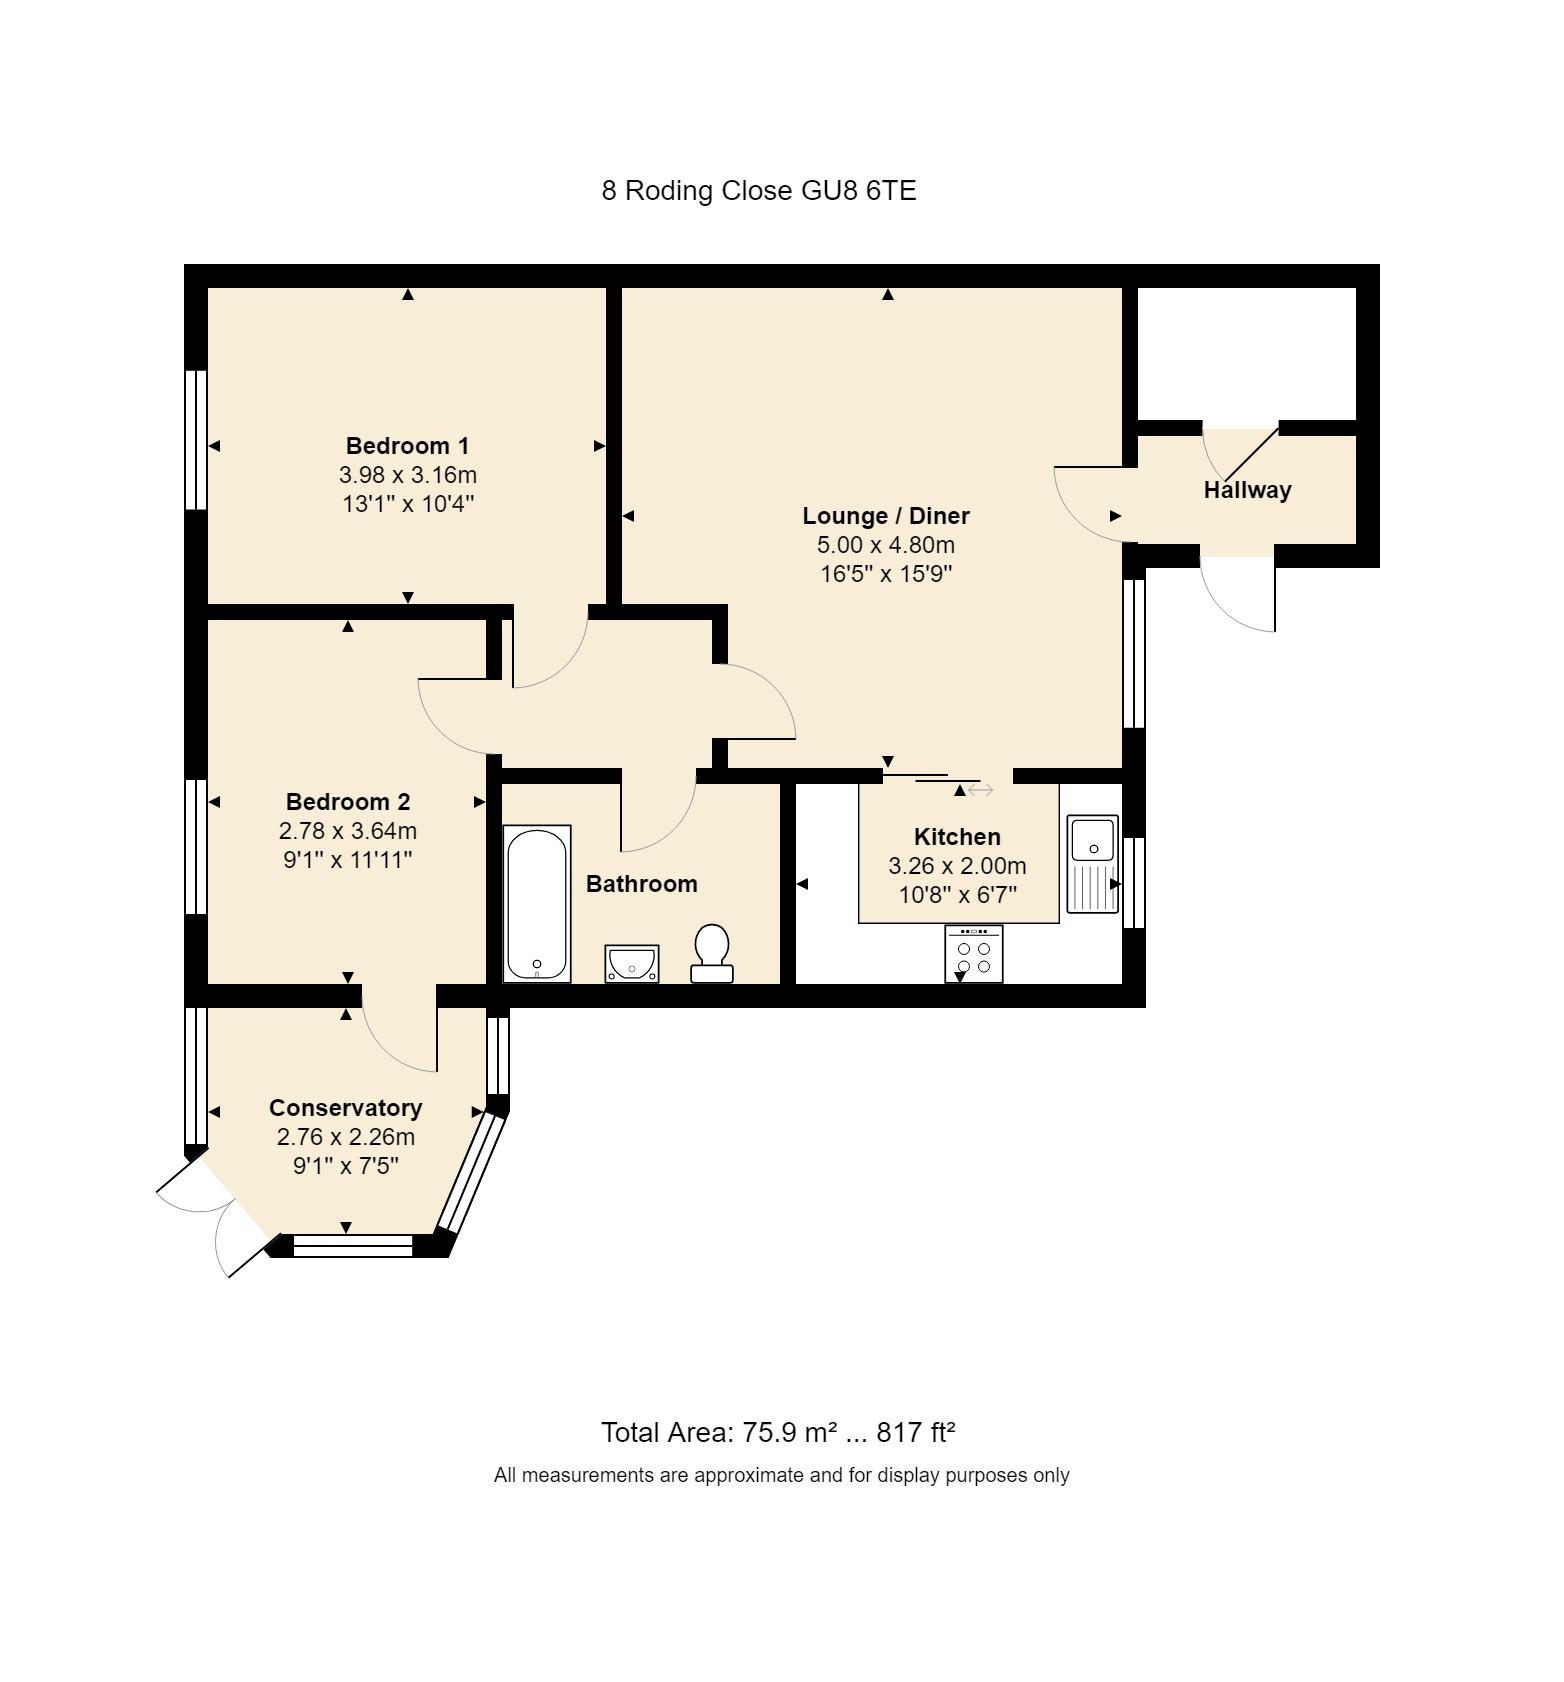 8 Roding Close Floorplan